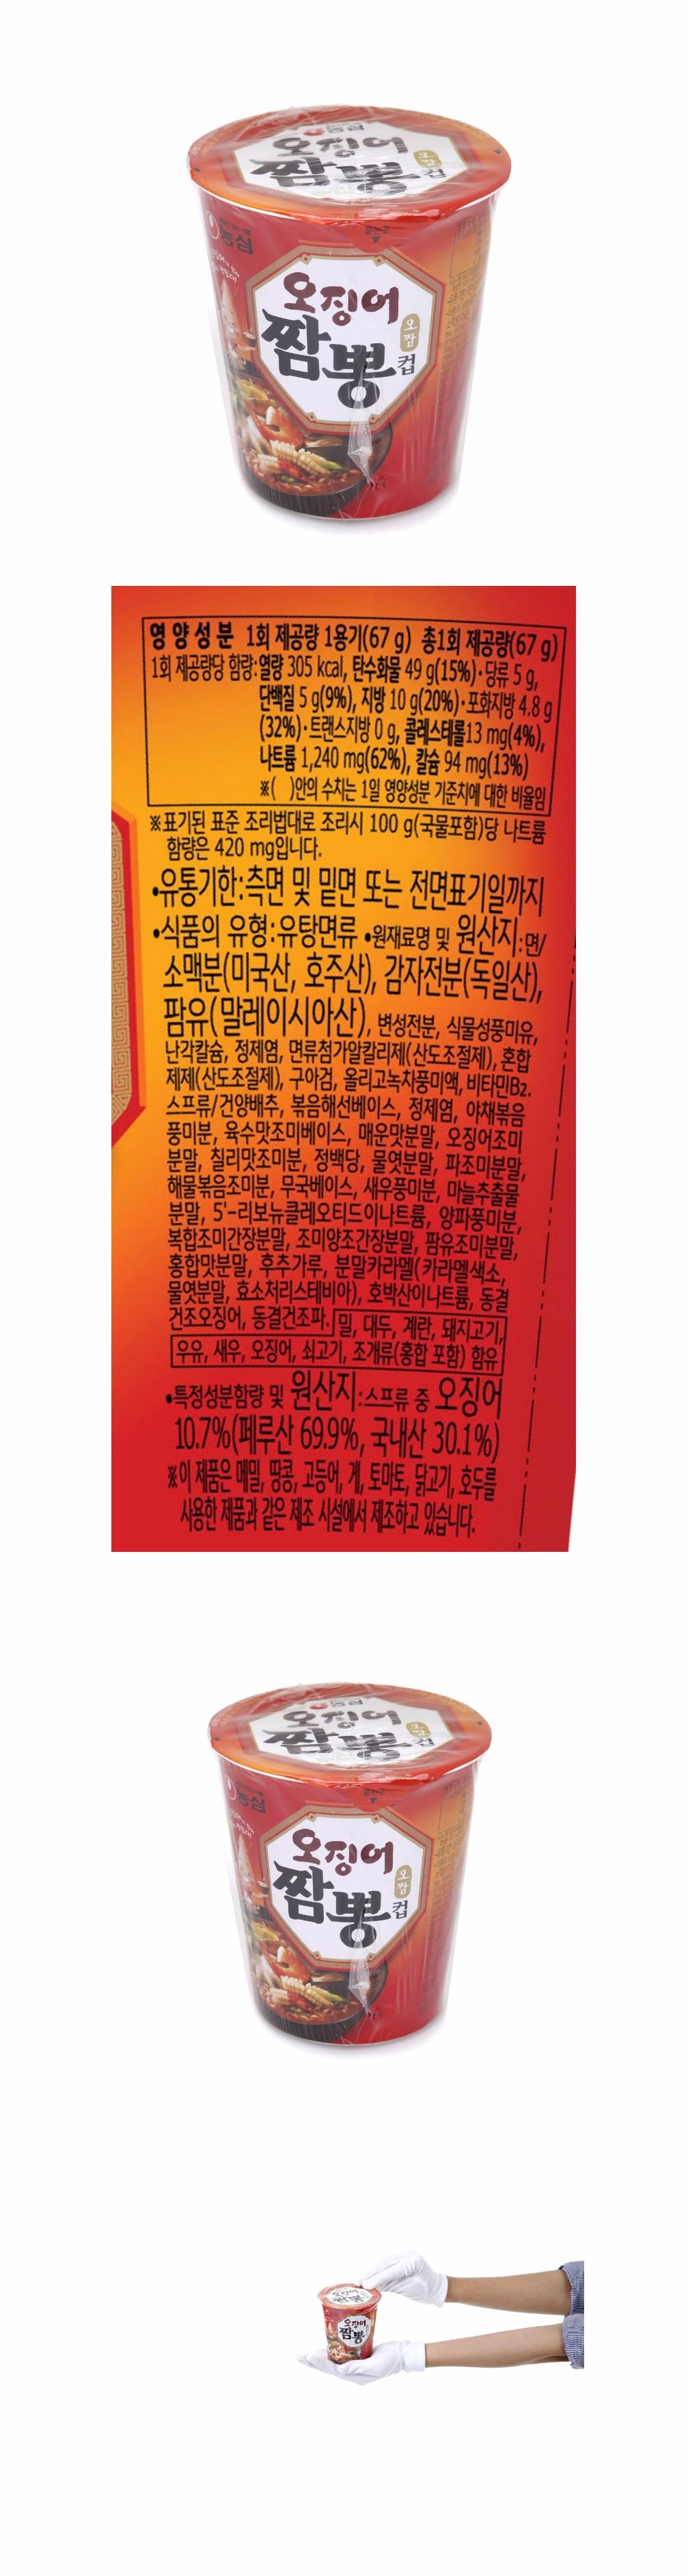 -nongshim-squid-jjamppong-67g.jpg